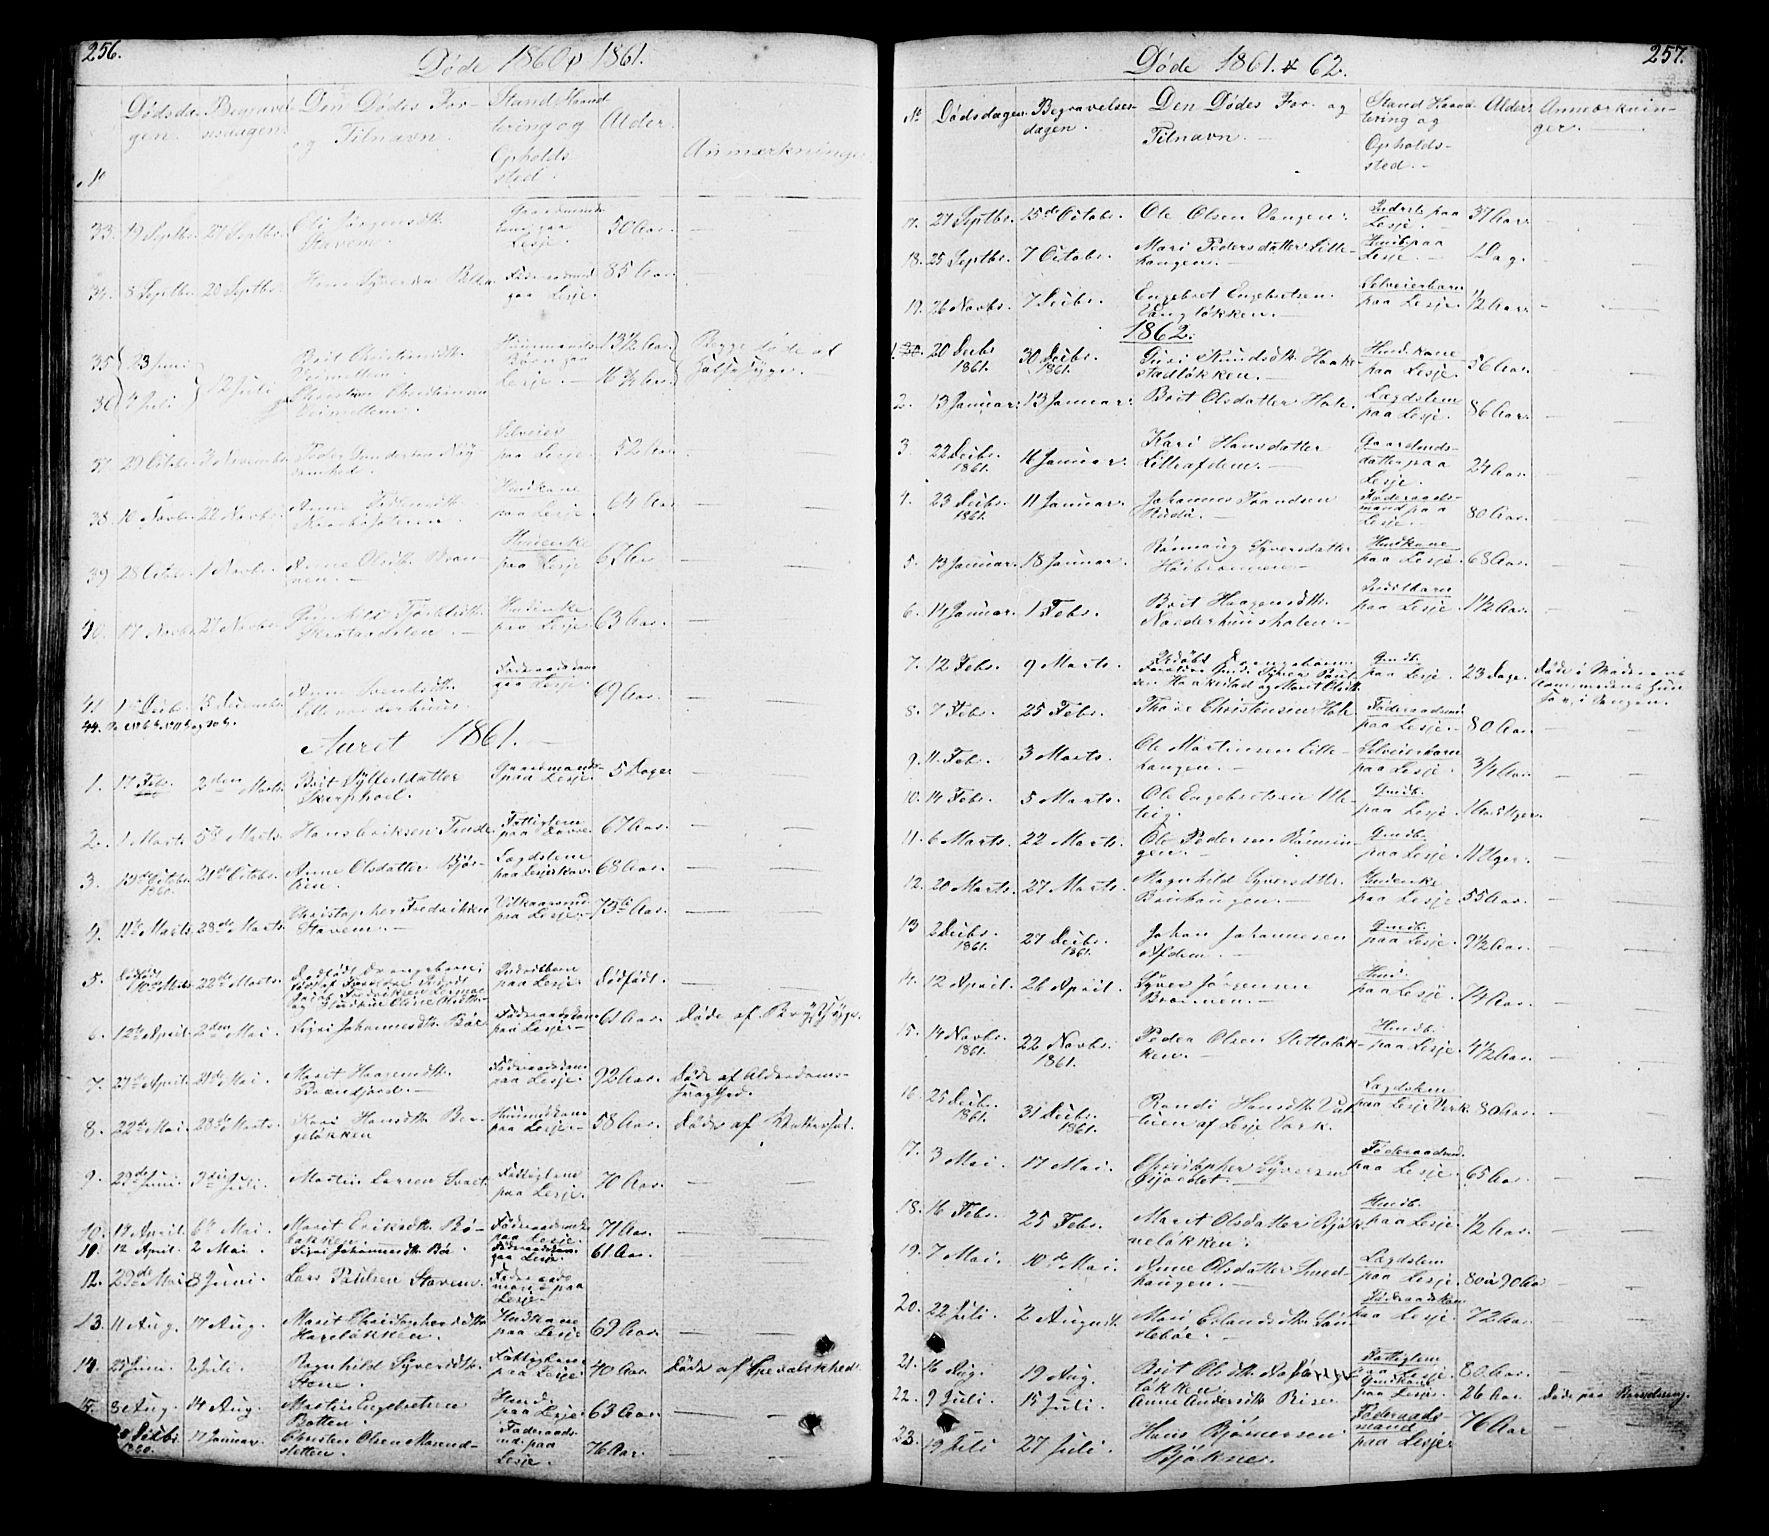 SAH, Lesja prestekontor, Klokkerbok nr. 5, 1850-1894, s. 256-257